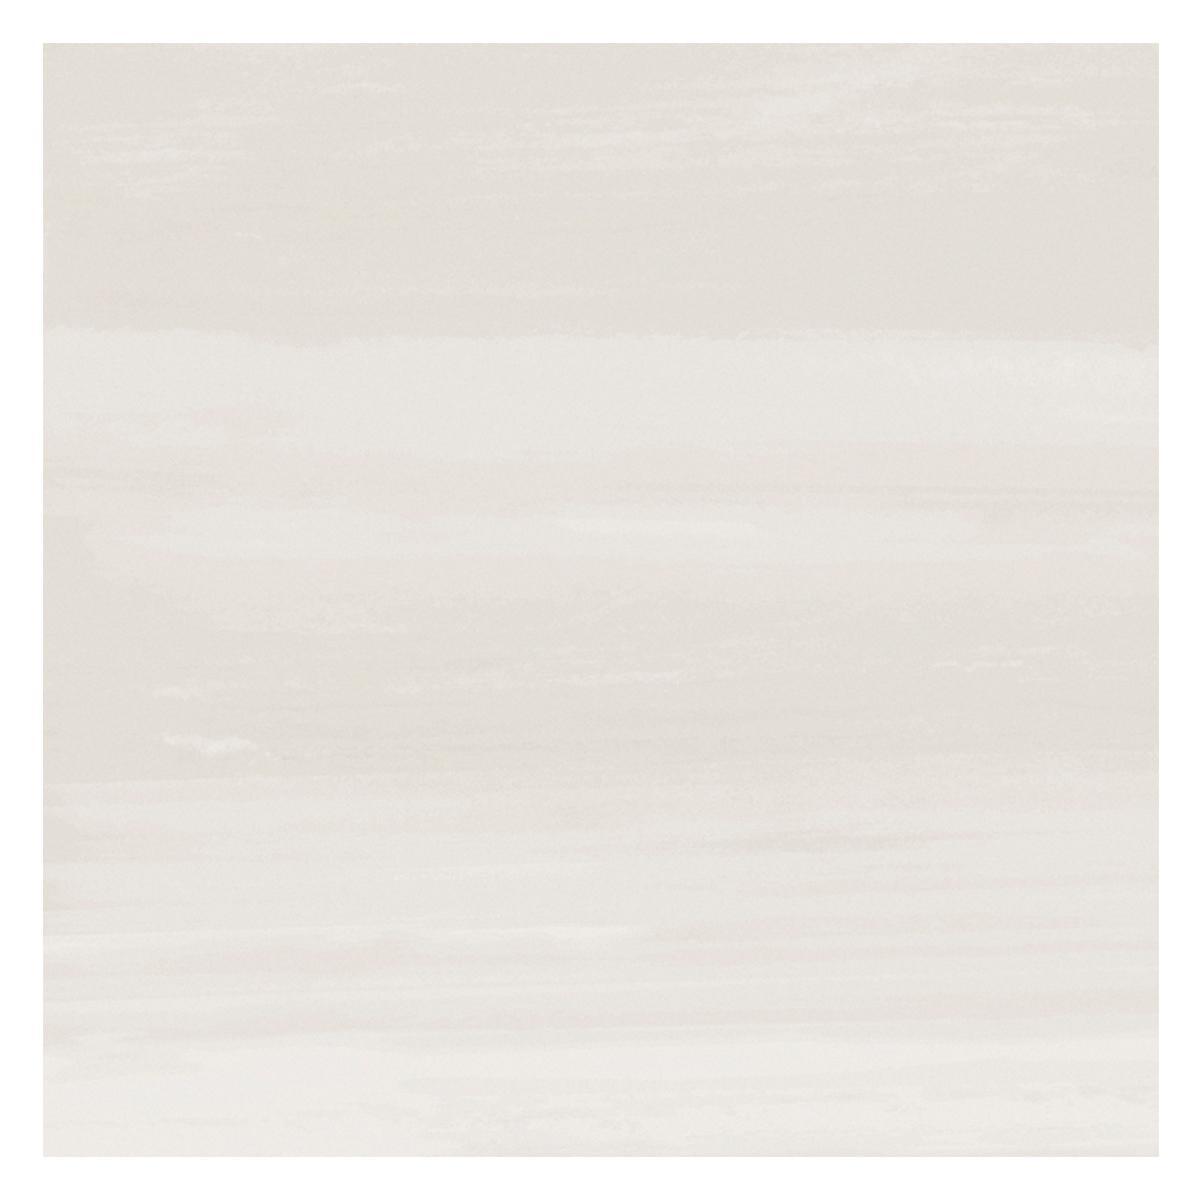 Porcelanato Jazz Marfil Brillante - 60.8X60.8 cm - 1.48 m2